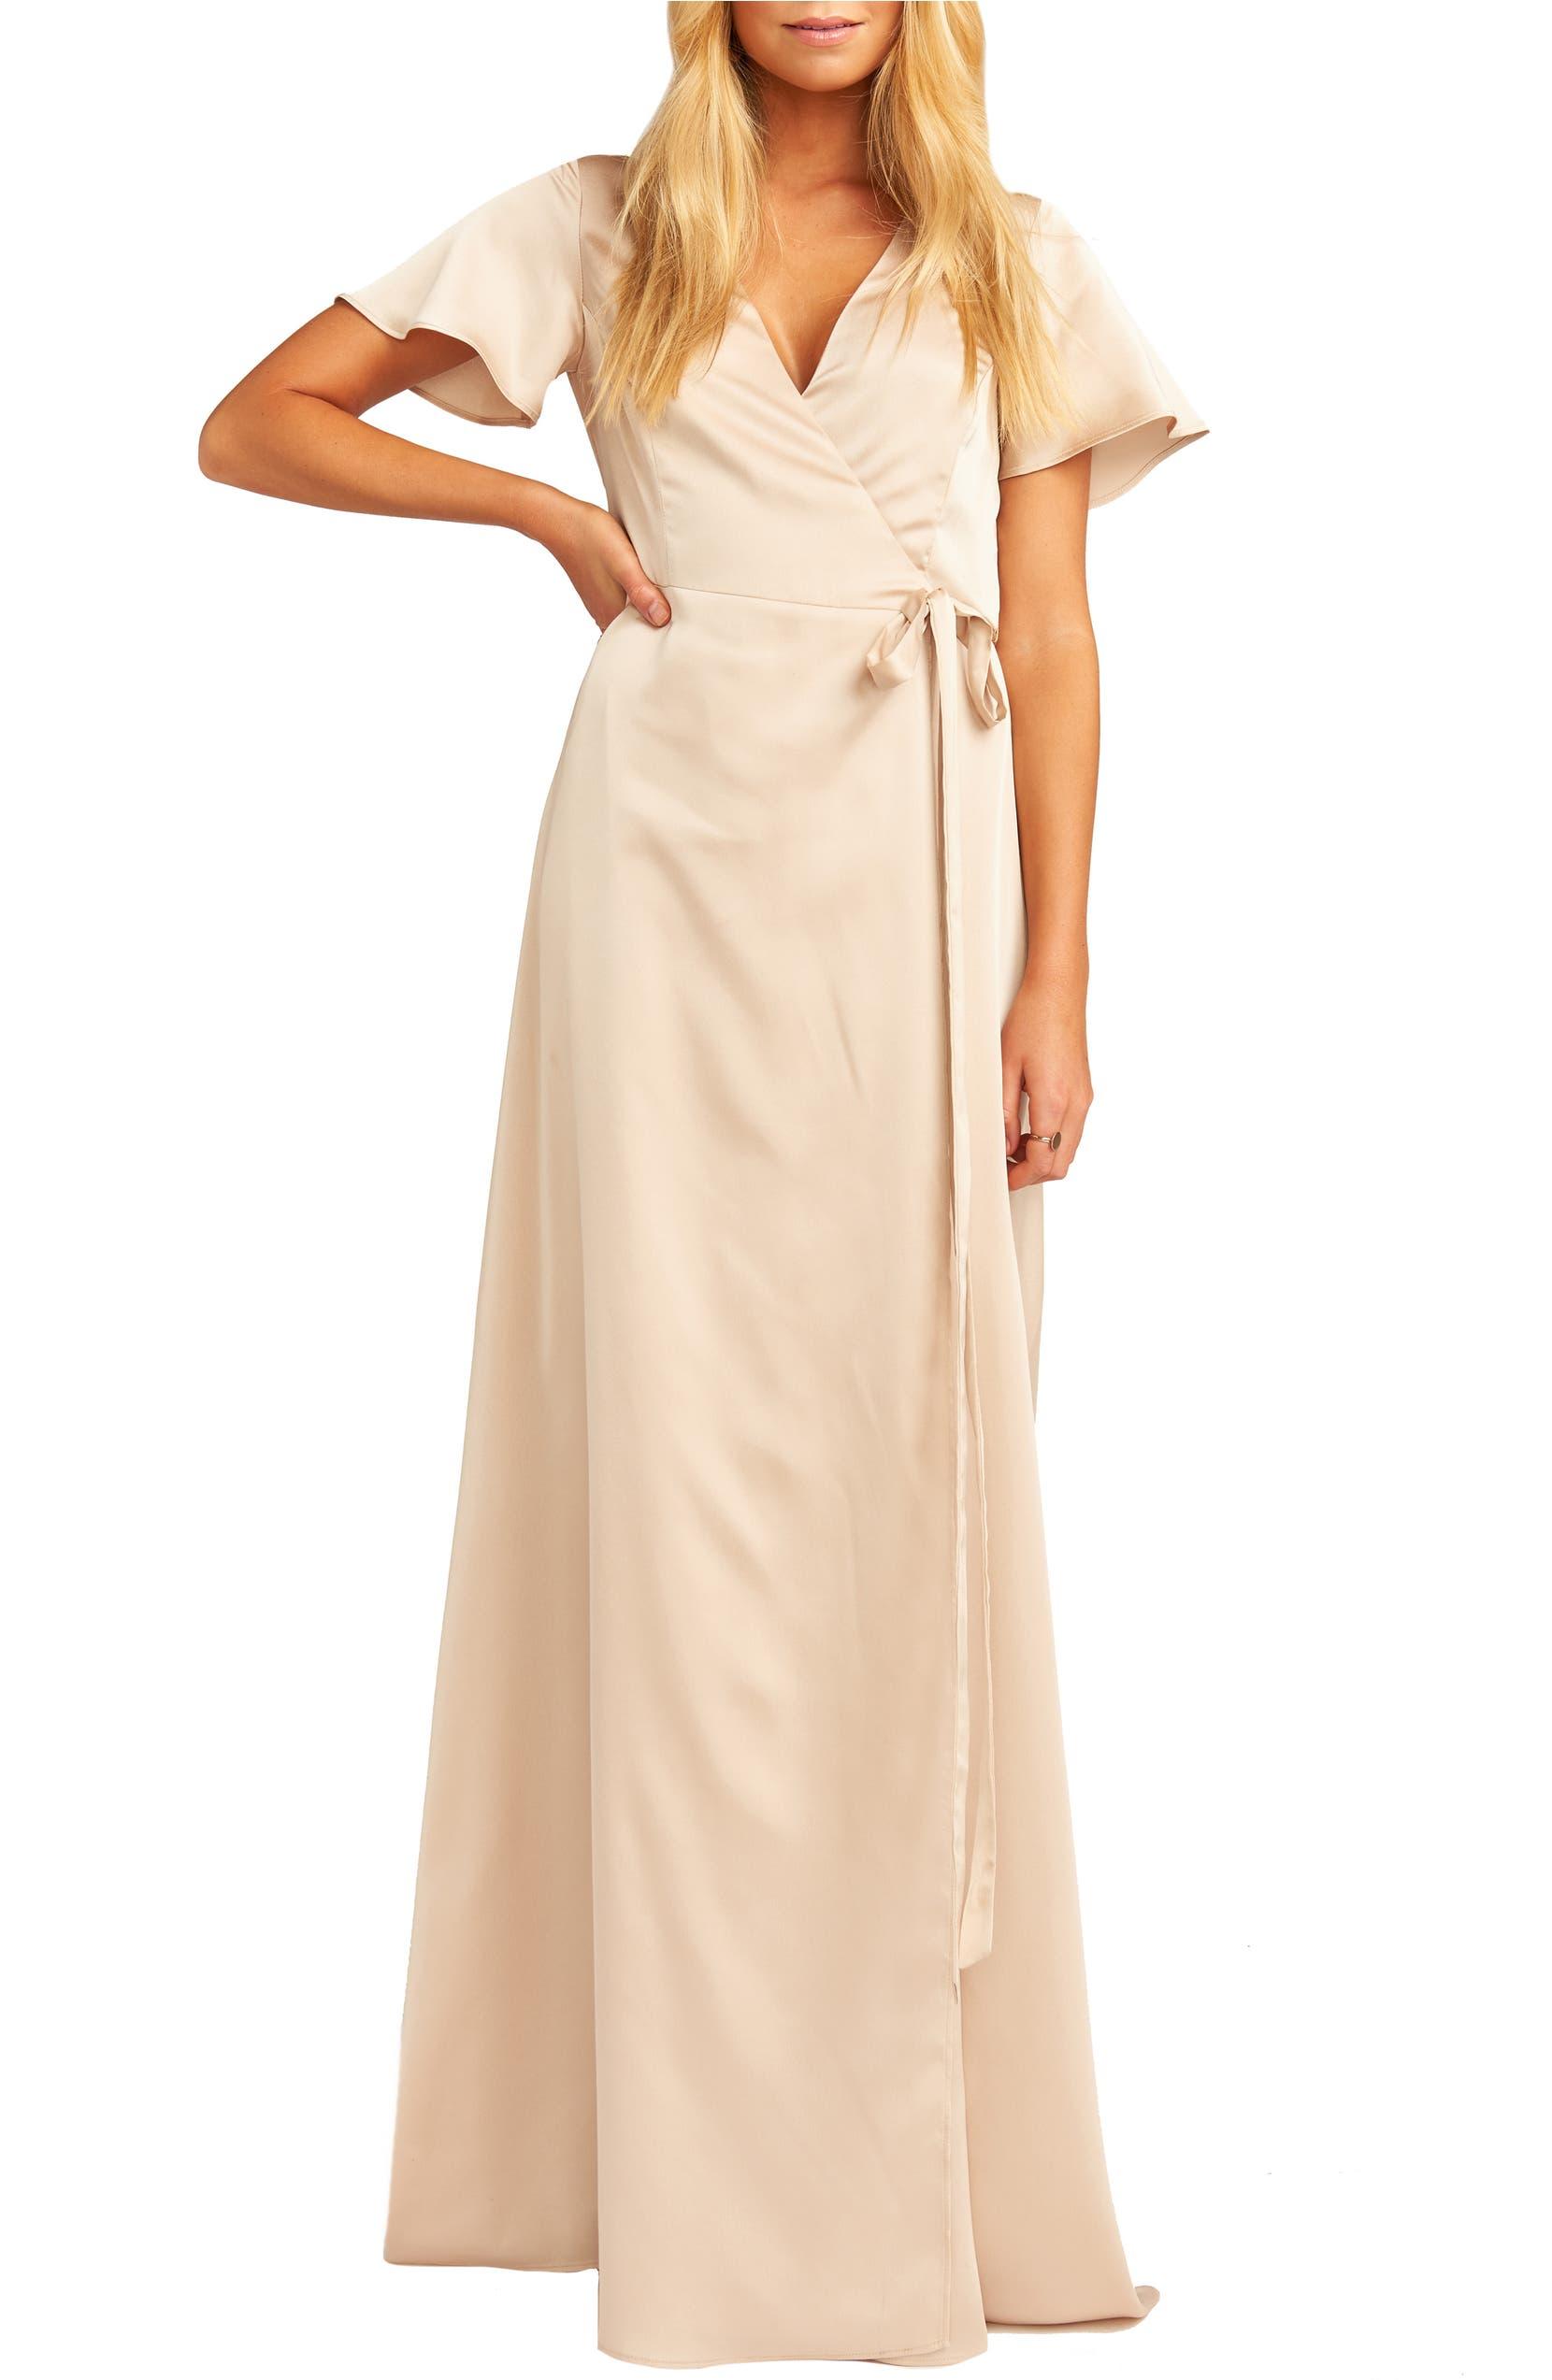 d4570b2507415 Noelle Satin Wrap Evening Dress